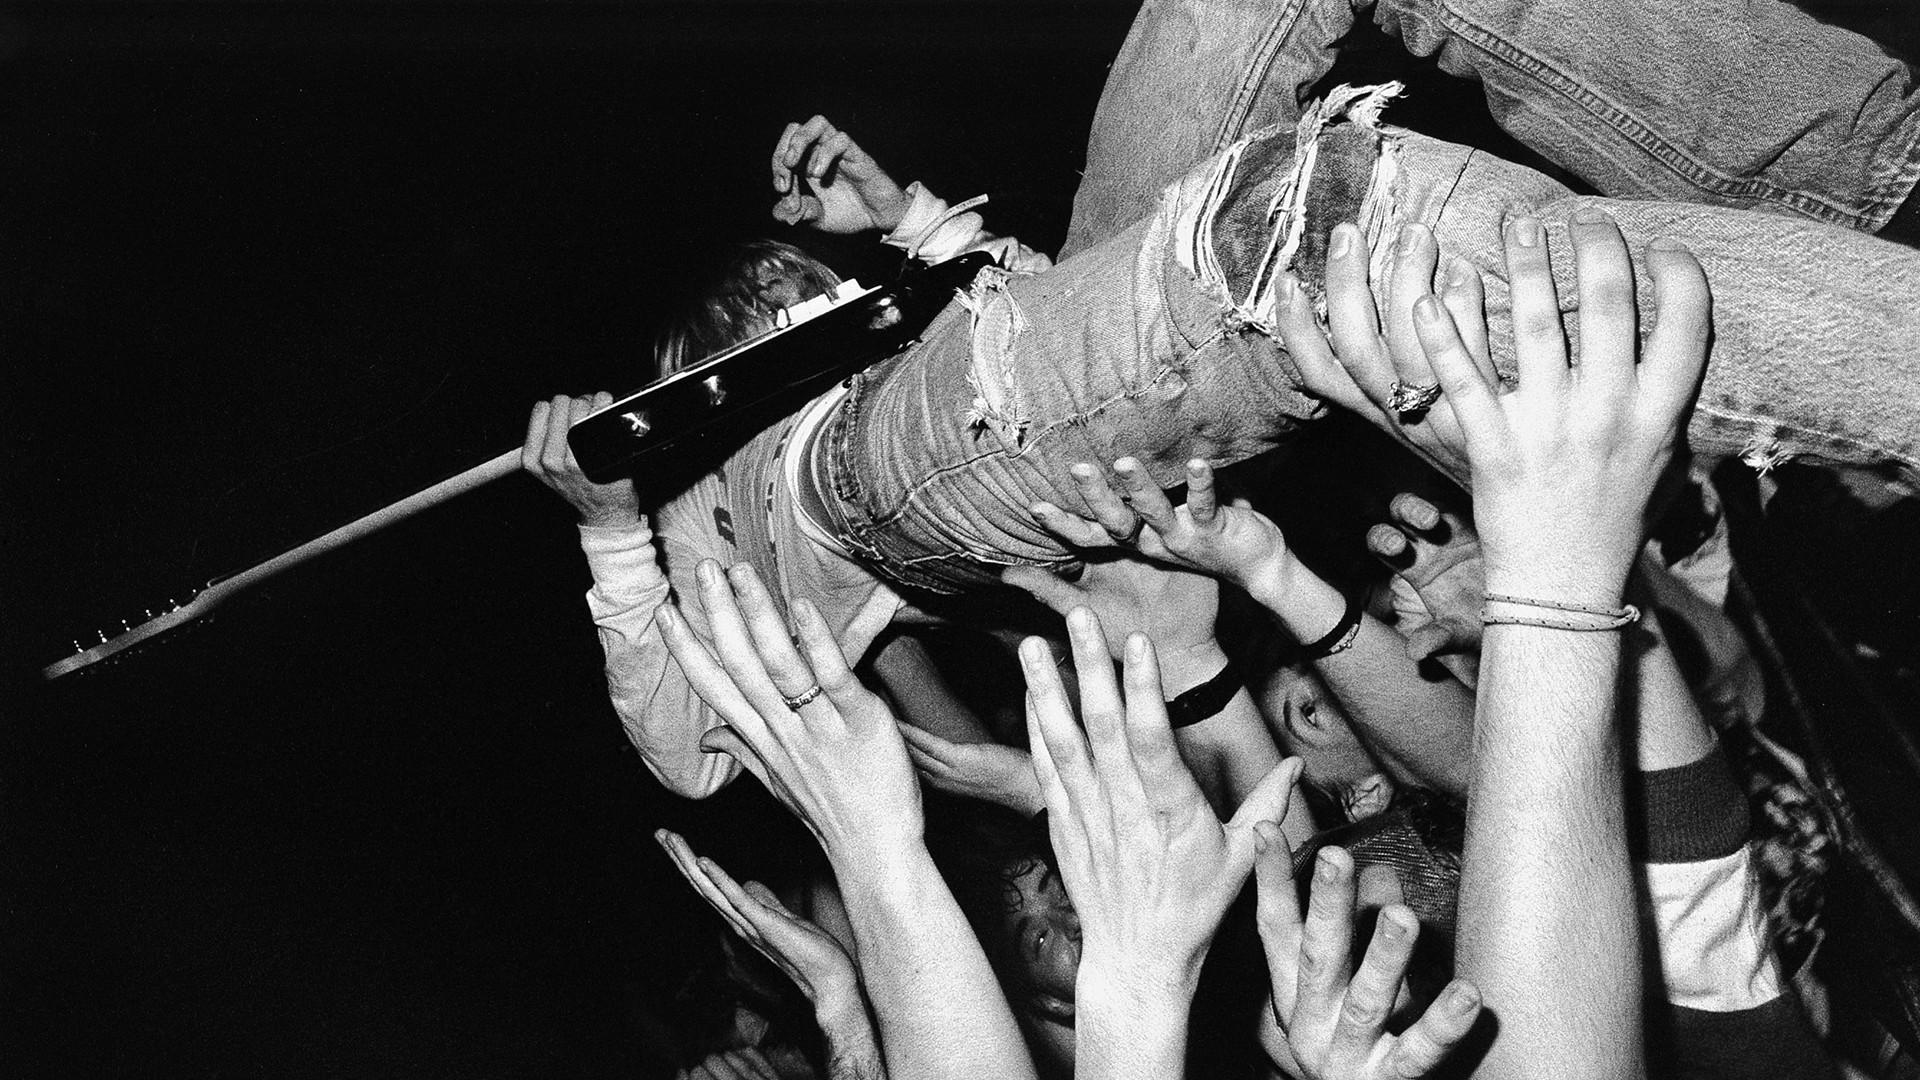 Bring back Punk Rock